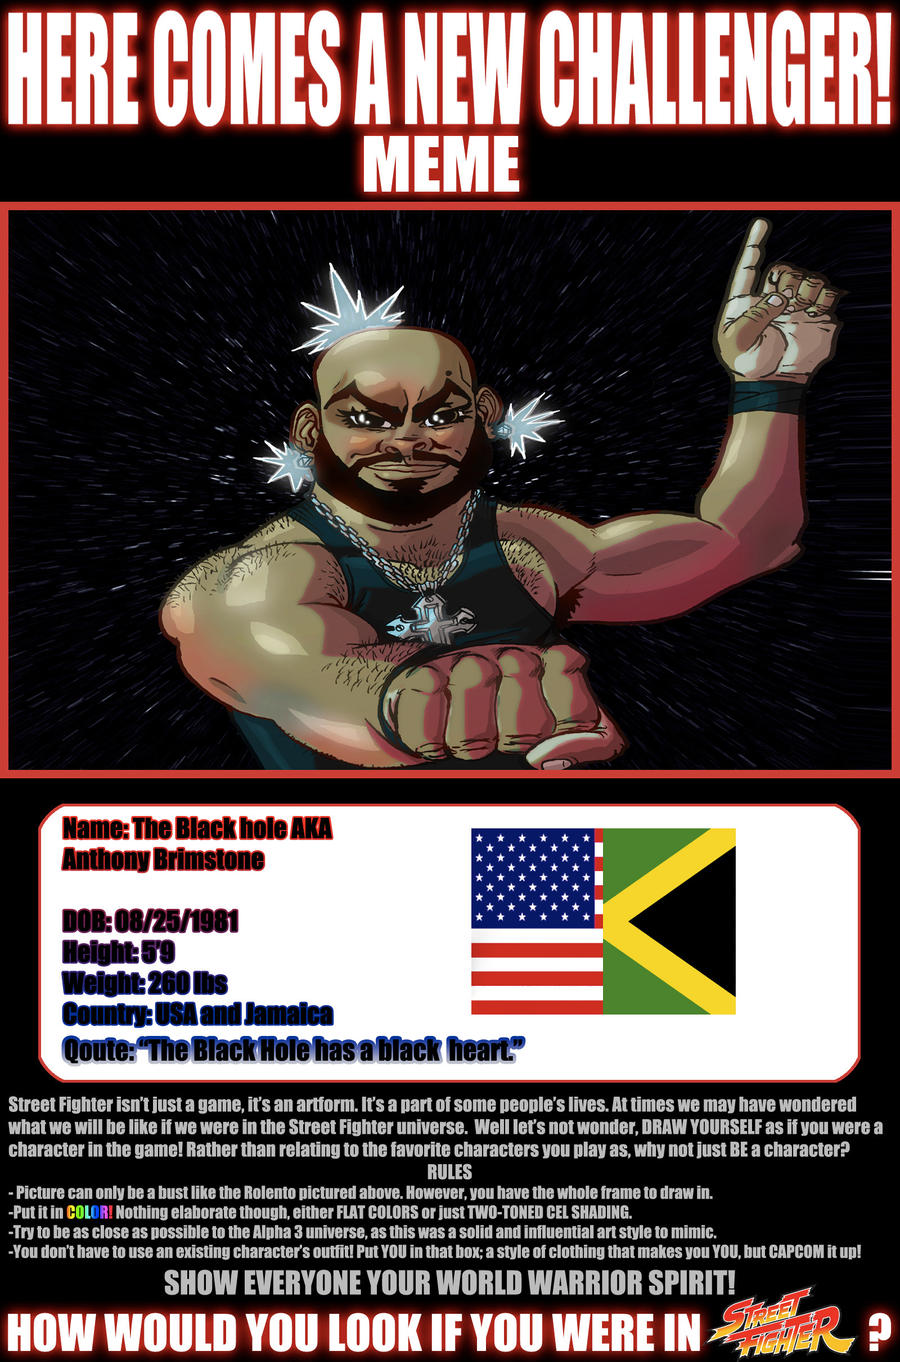 New Challenger Meme by KirbBrimstone